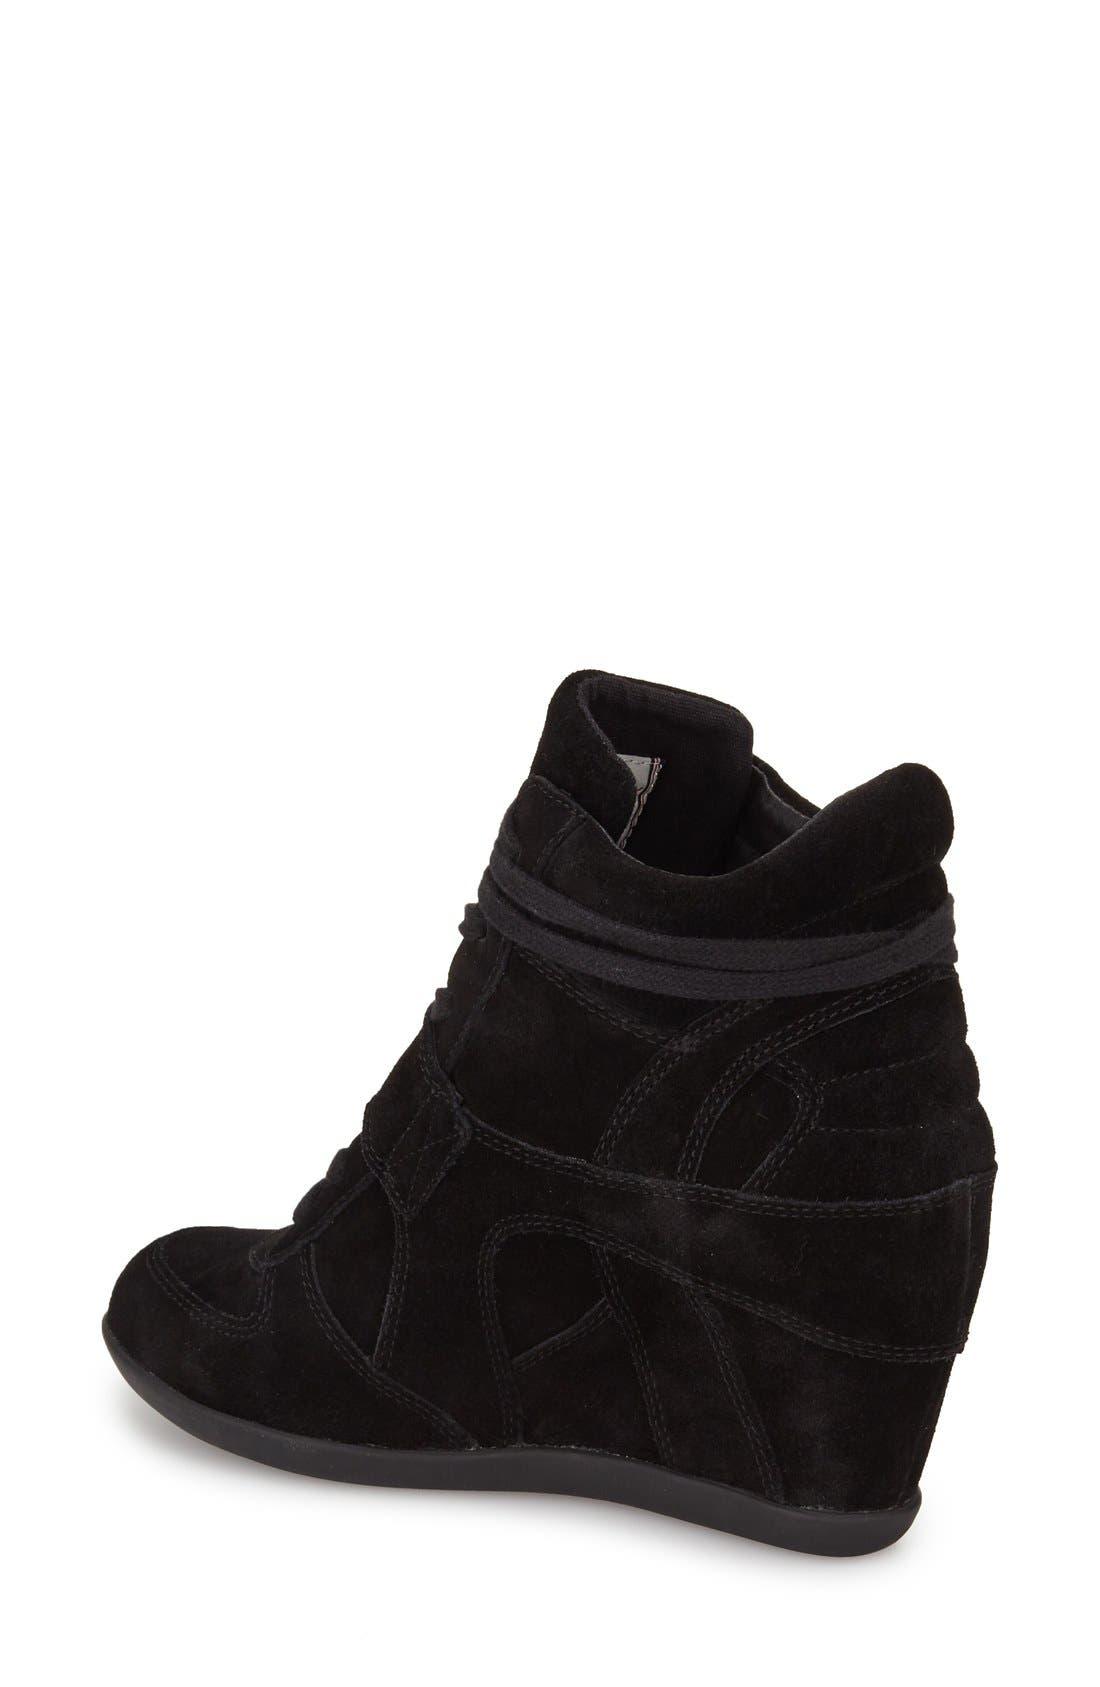 Alternate Image 2  - Ash 'Bowie' Sneaker